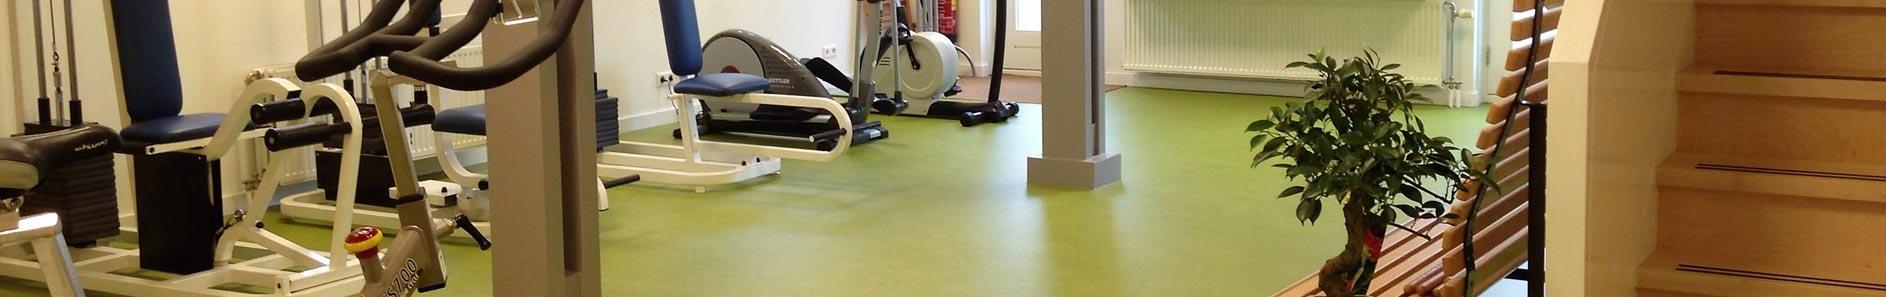 FysioFitness Sporten bij de ysiotherapeut